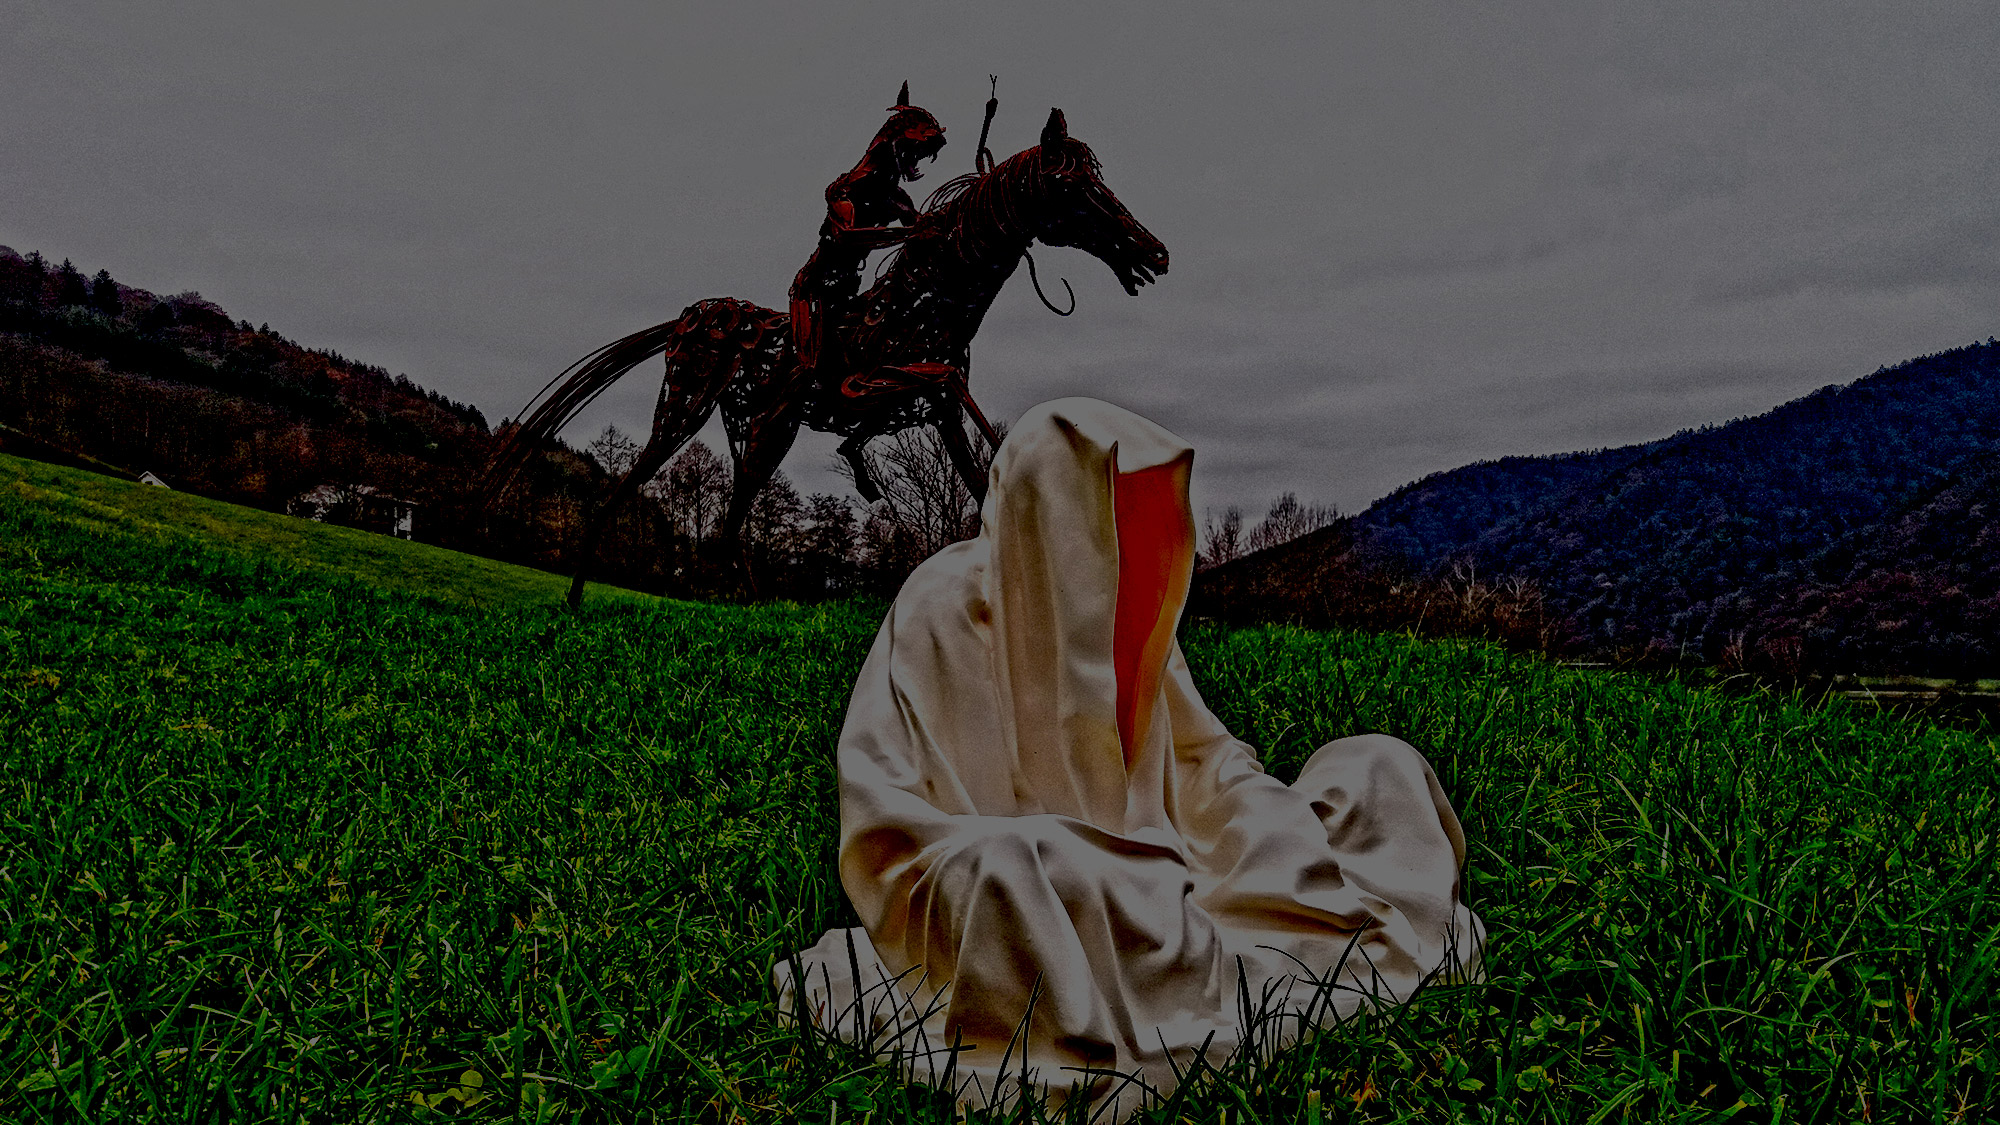 atelier-fahrner-guardians-of-time-manfred-kielnhofer-horse-wolf-statue-sculpture-contemporary-art-fineart-arts-gallery-museum-sculpturepark-sculpturegarden-ghost-faceless-mystic-show-110758